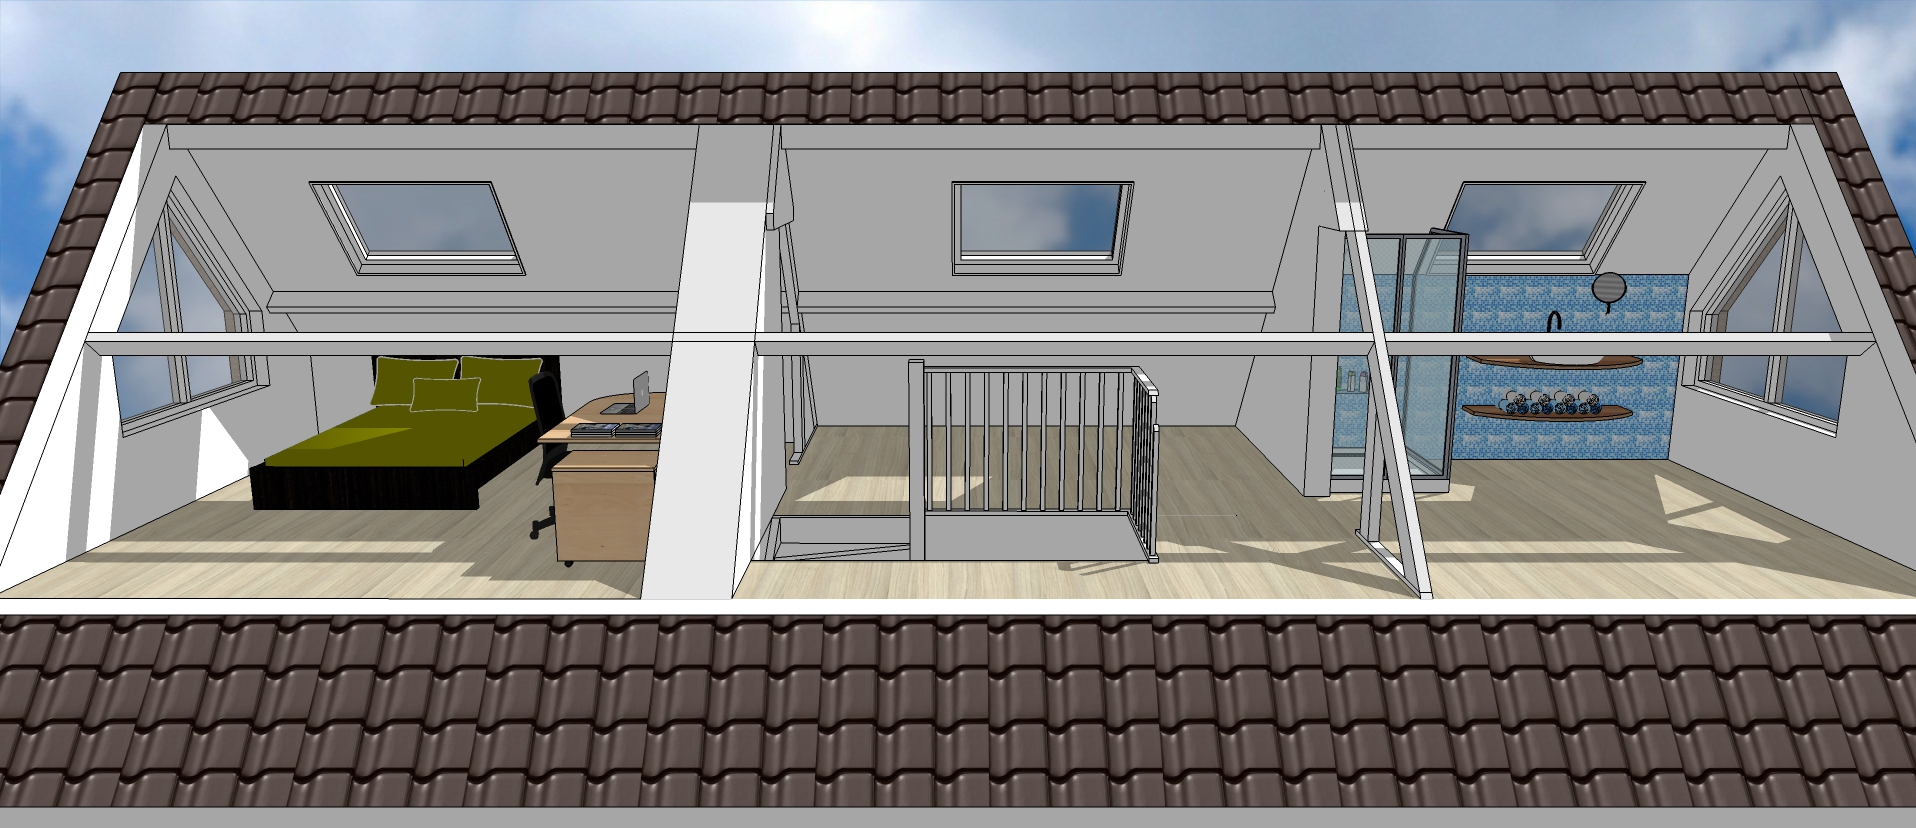 3D verbouwingsontwerp indeling zolder met slaapgedeelte en badkamer